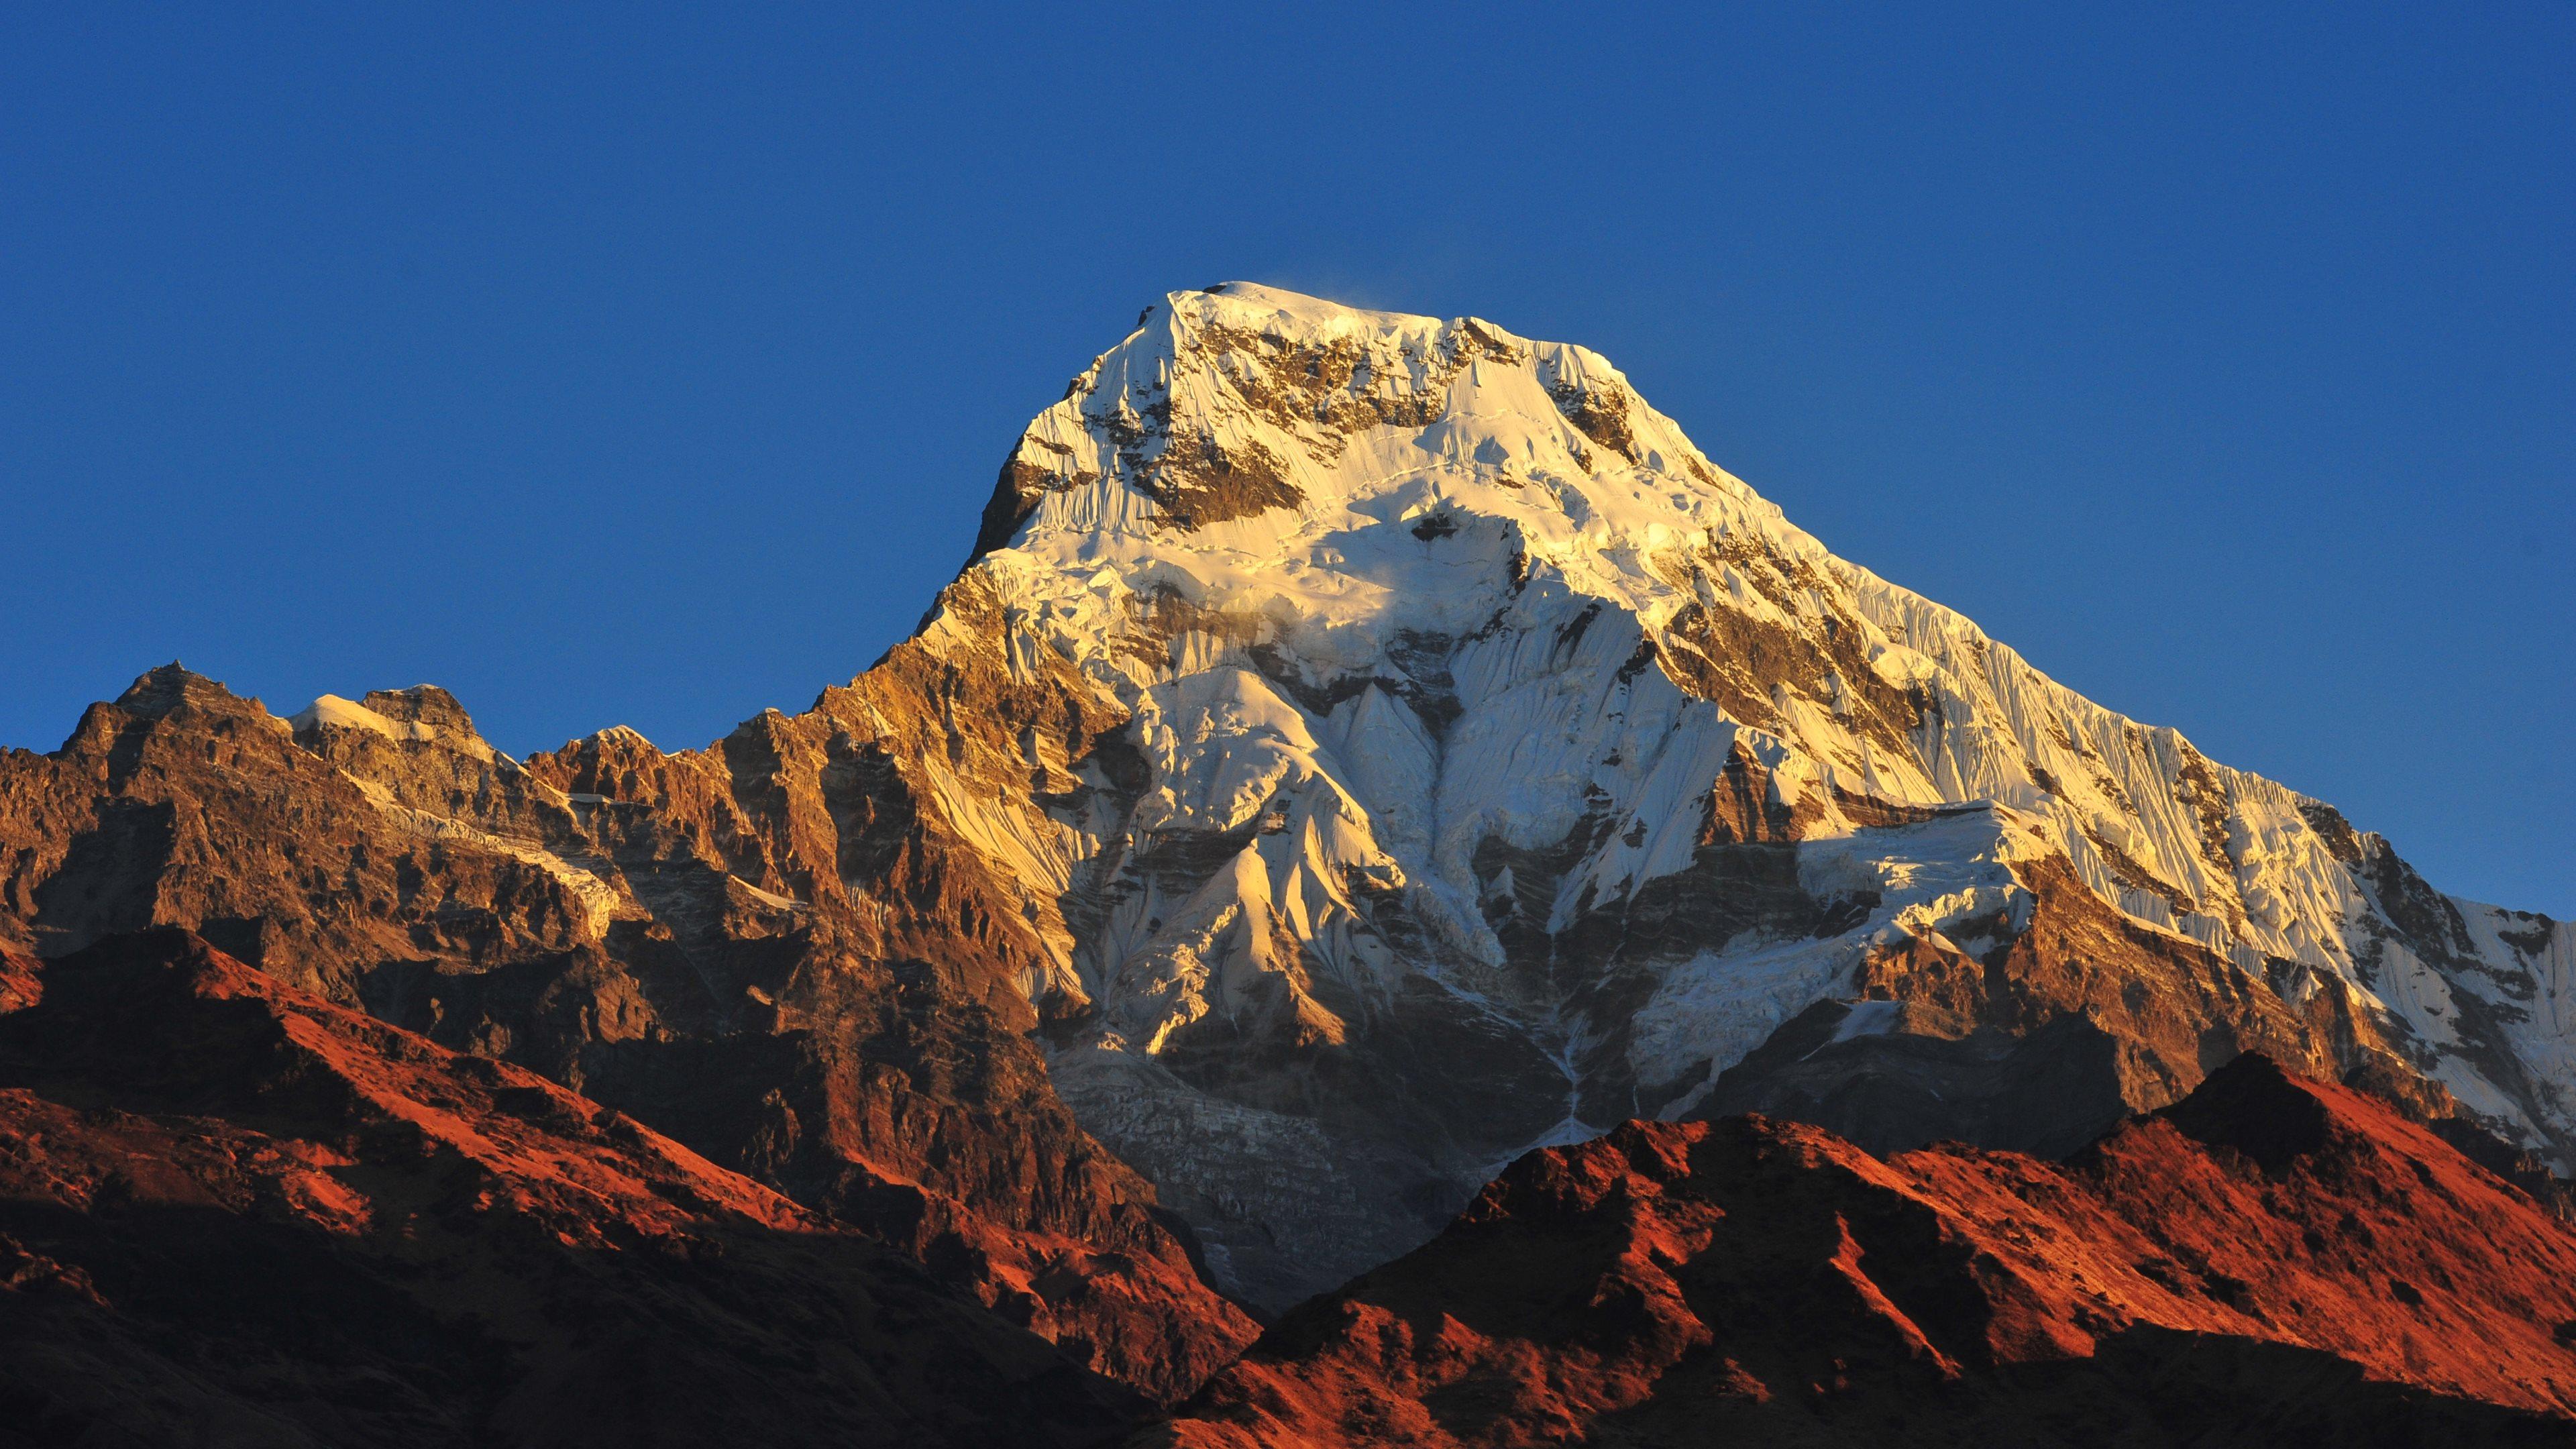 Annapurna Massif Mountain Range Nepal 4k Hd Nature 4k